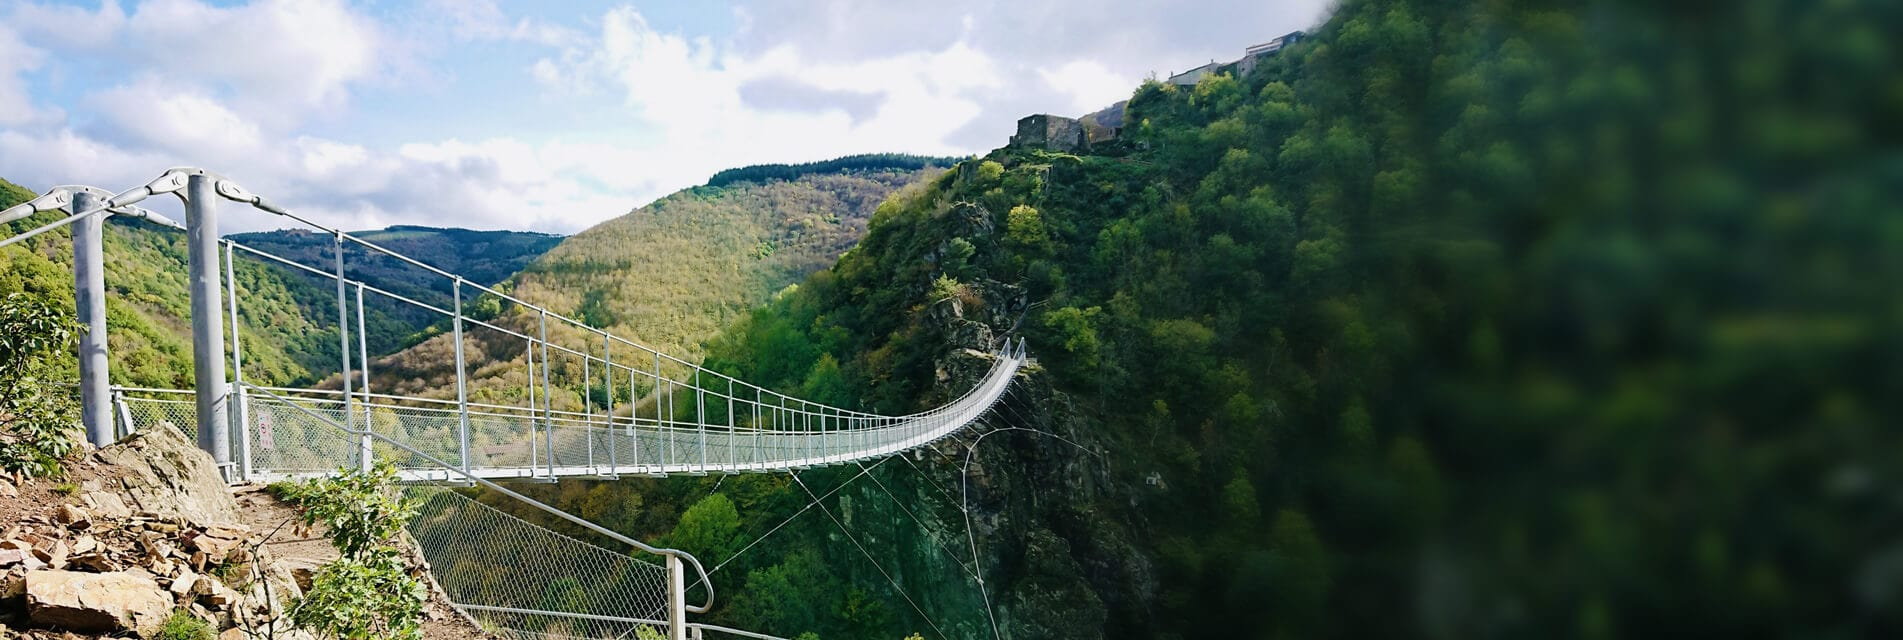 Séjourner à Mazamet dans le Tarn Occitanie